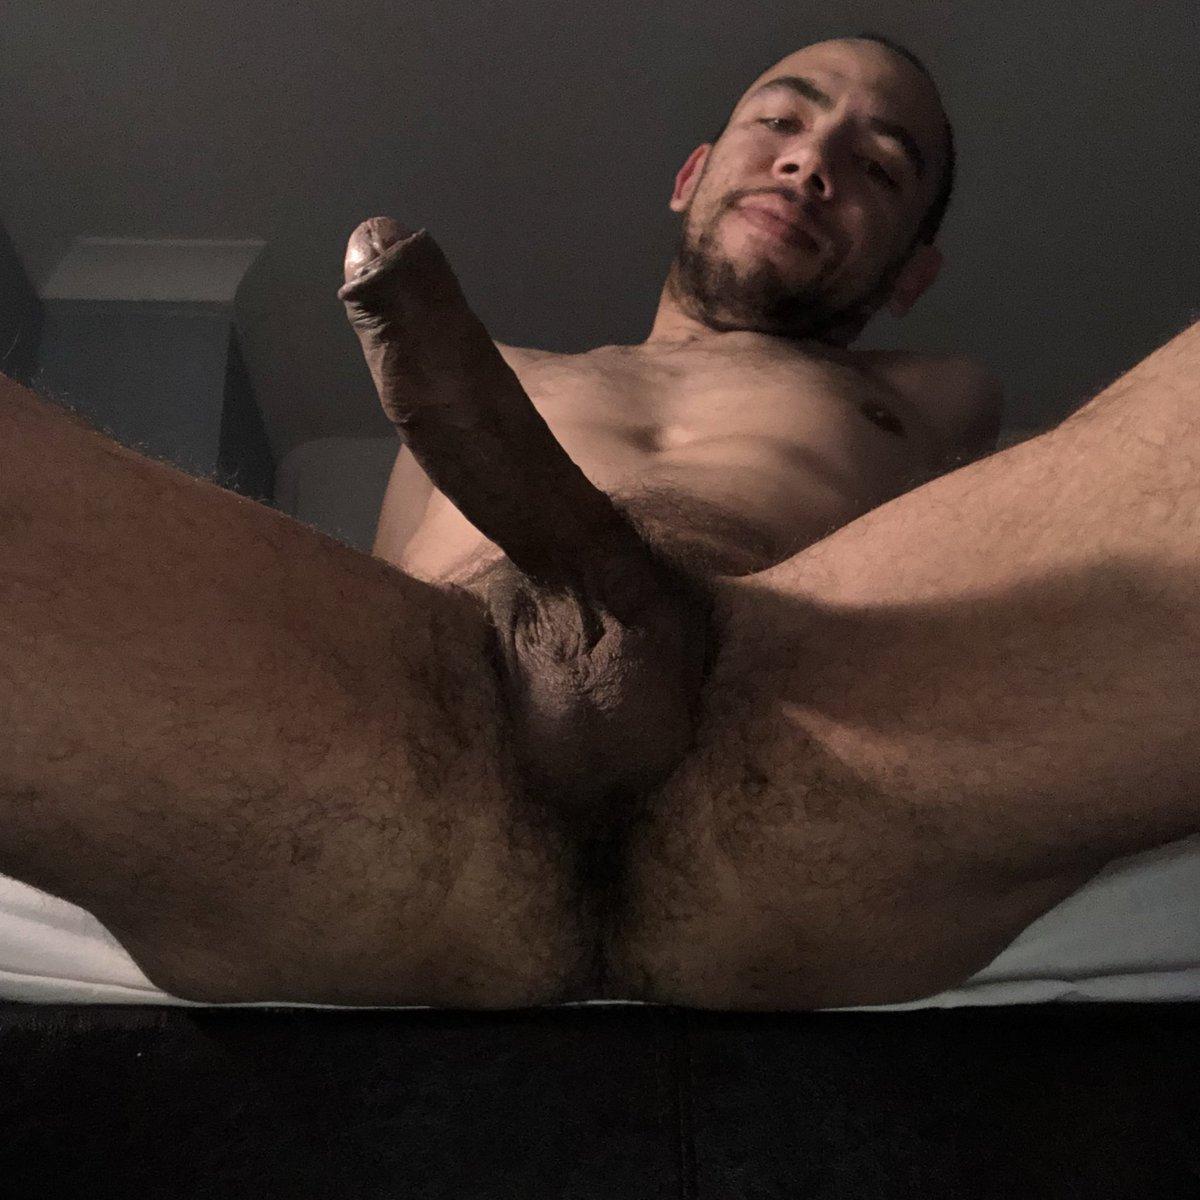 Edmundo castro muscle man gay porn star